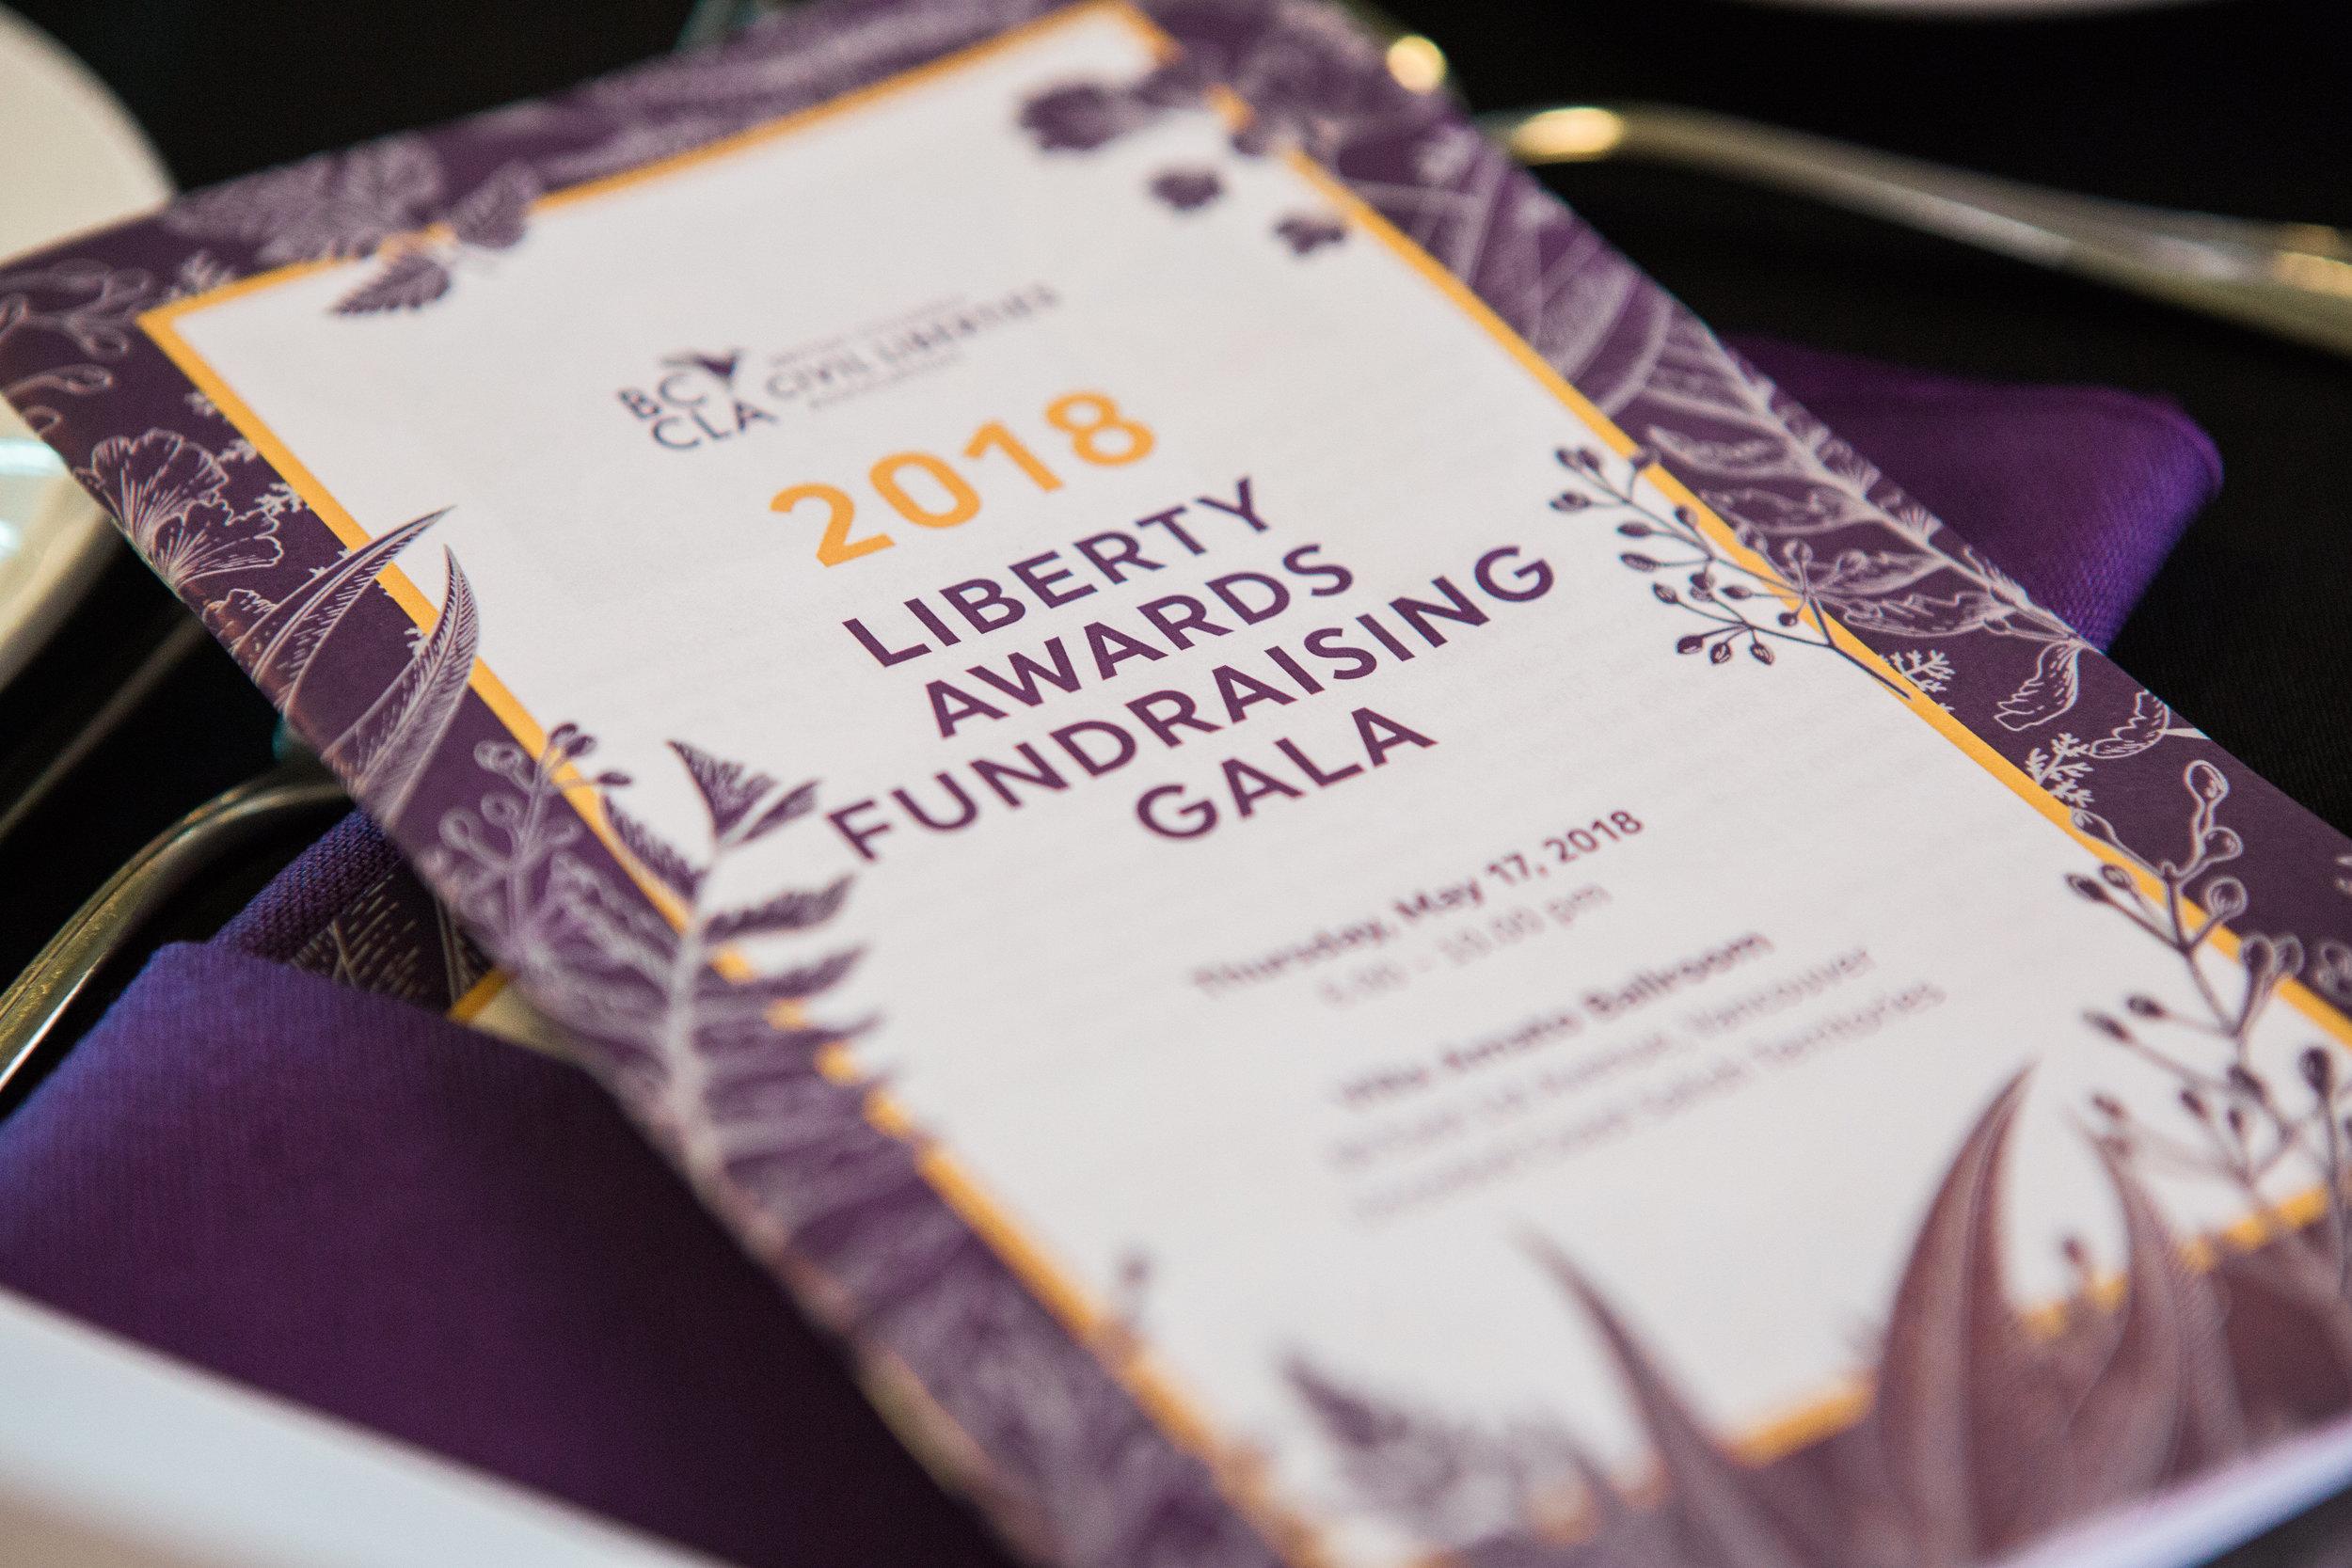 bccla liberty awards gala charity fundraiser vancouver